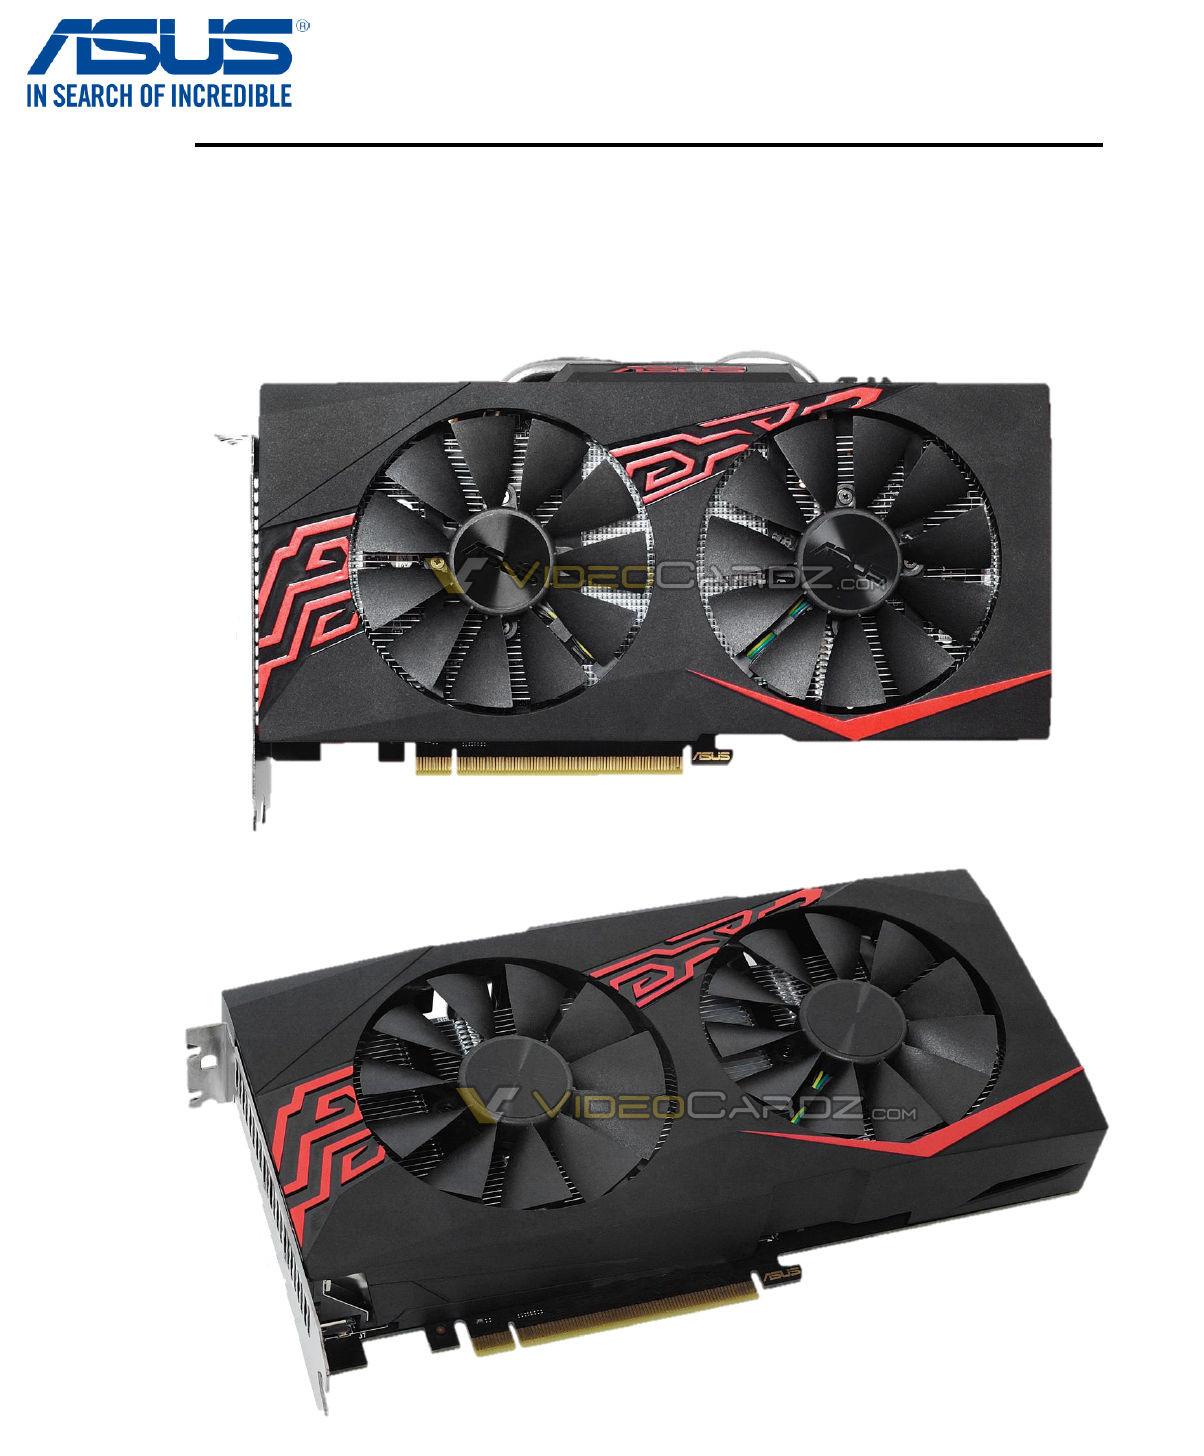 Nvidia Pascal Based Mining Gpu Lineup Detailed Techpowerup Rtx 3090 gaming x trio. nvidia pascal based mining gpu lineup